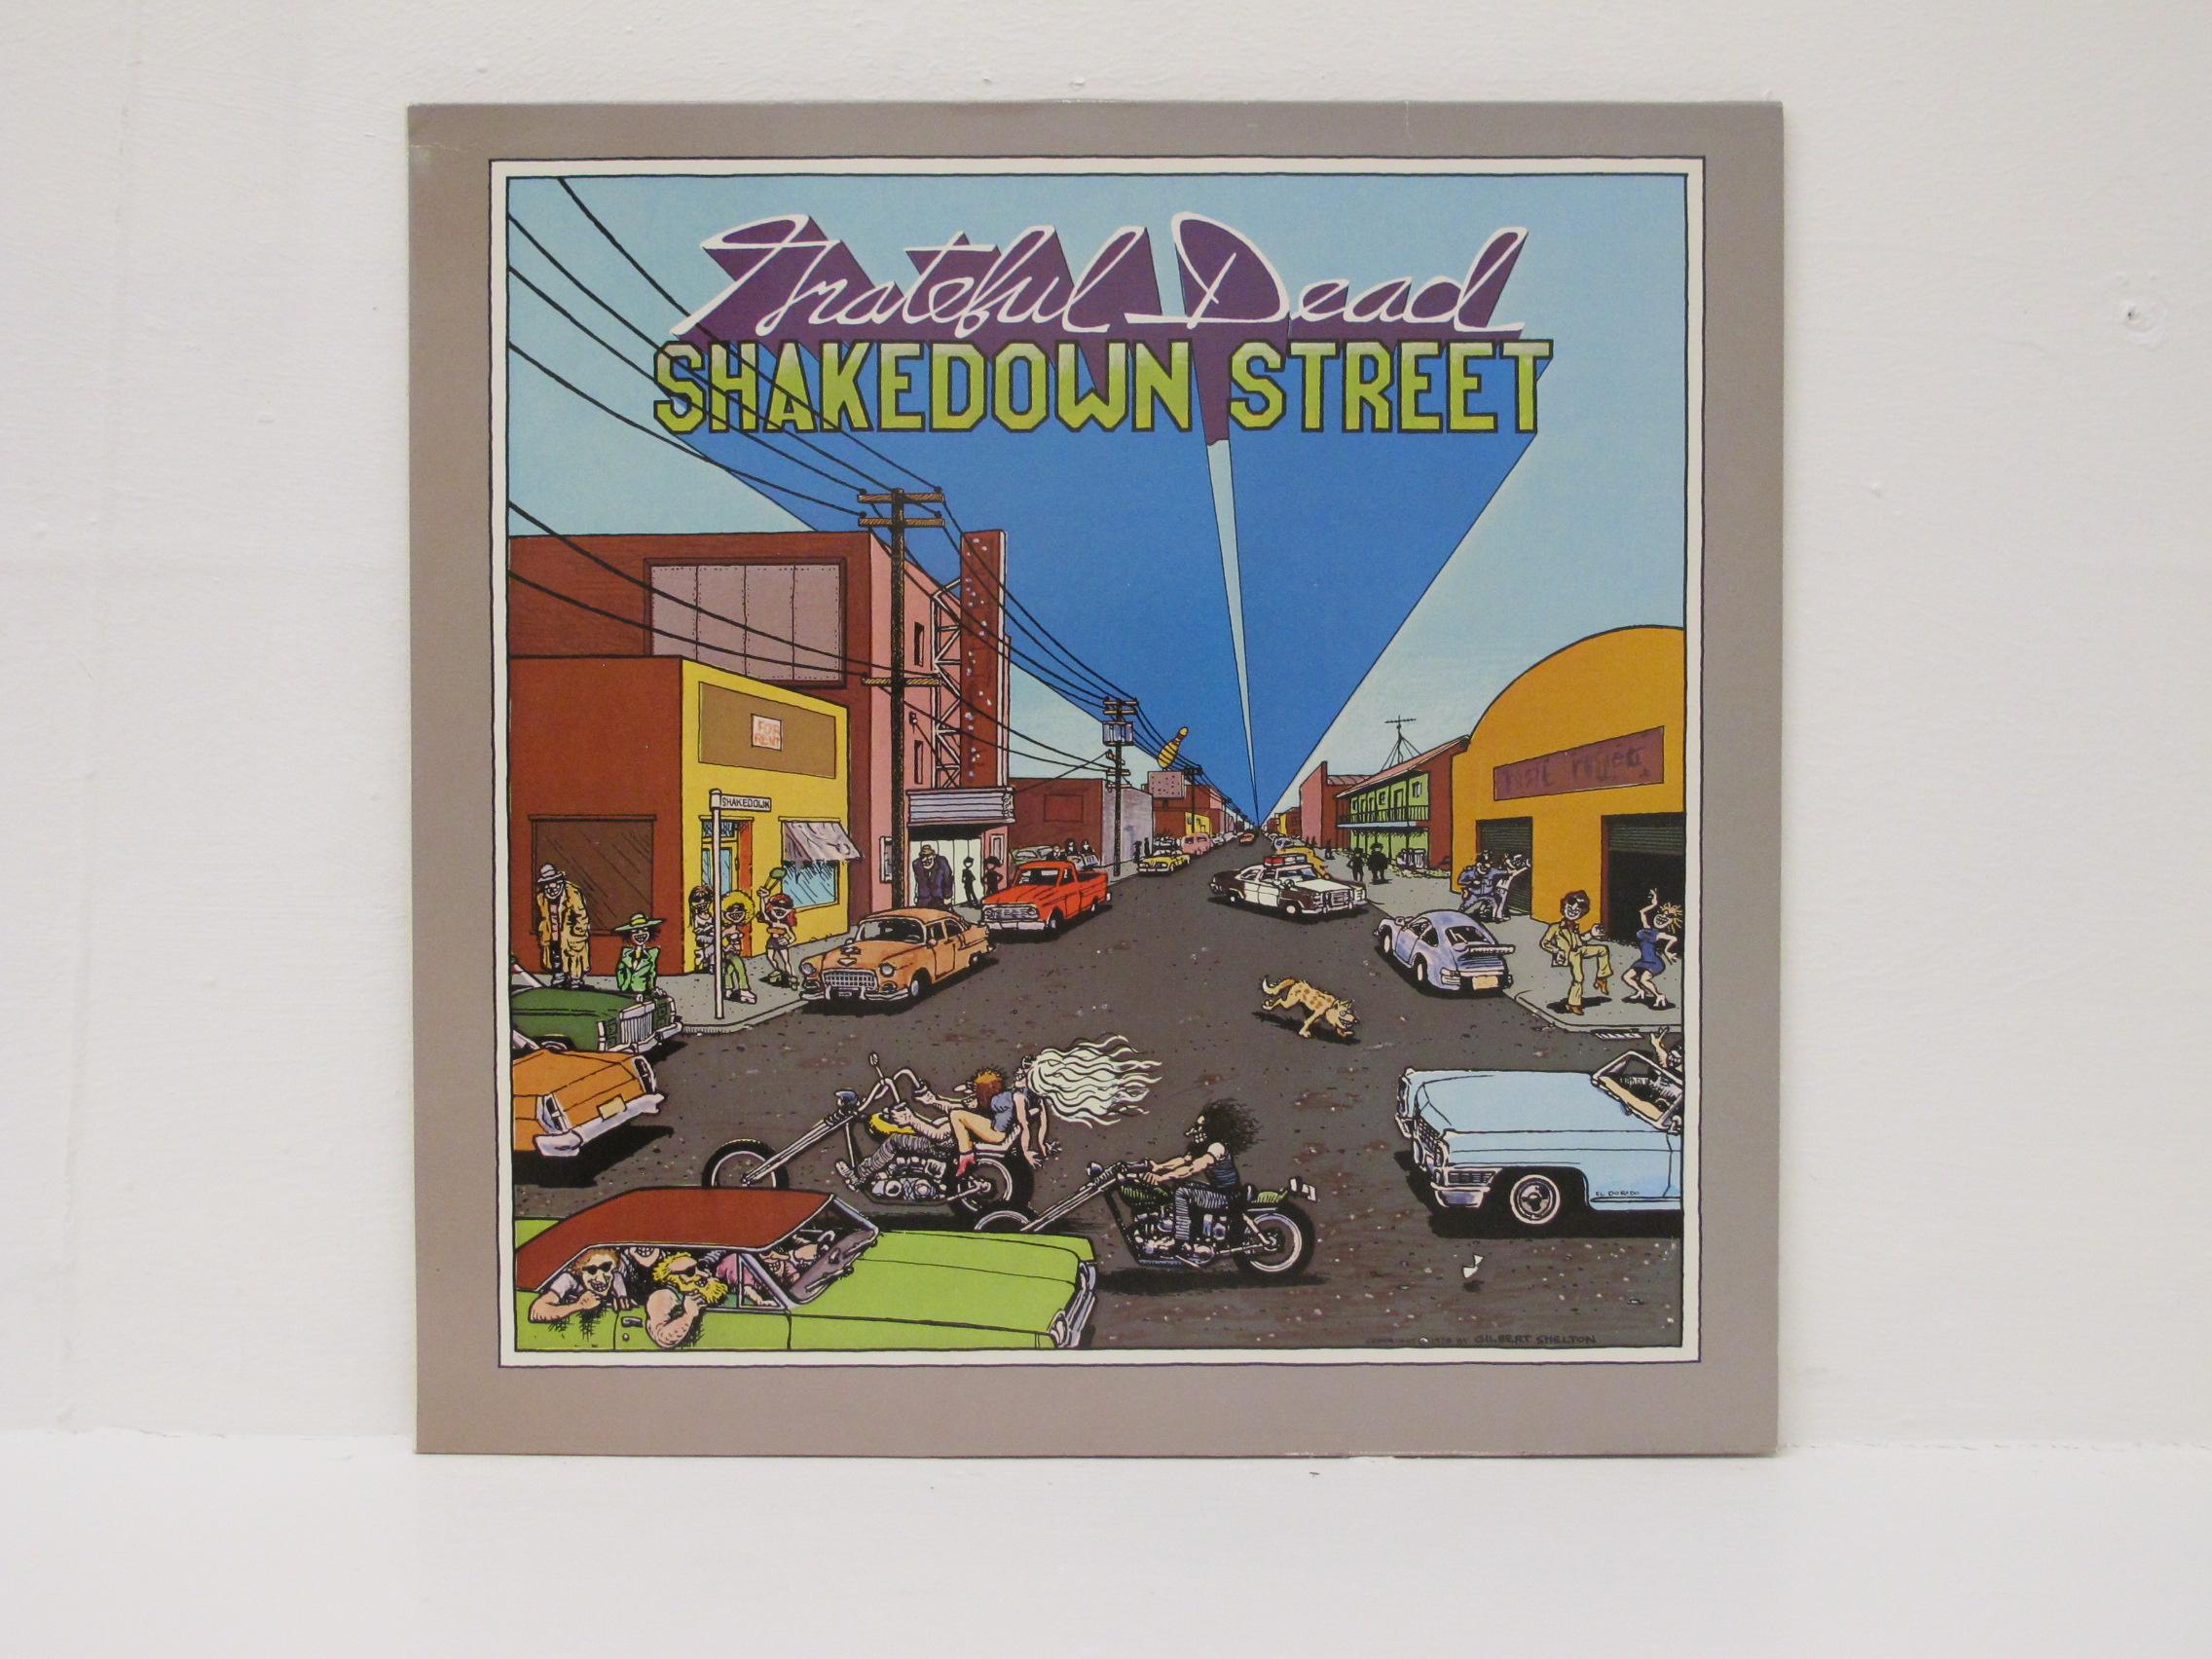 The Grateful Dead - Shakedown Street